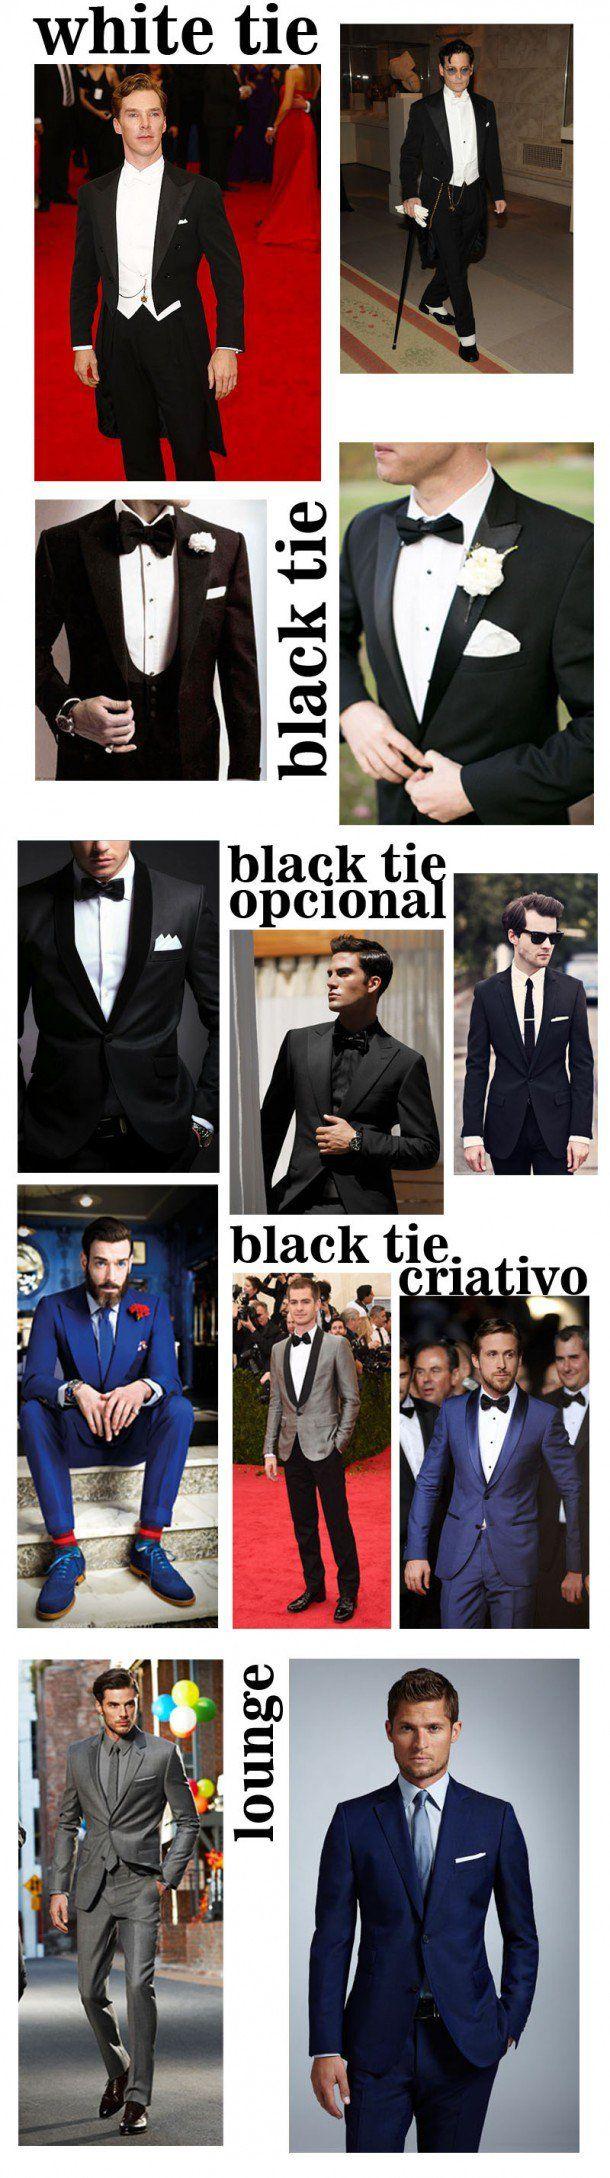 Dress code - White Tie, Back Tie, Black Tie Opicional, Black Tie Criativo, Lounge